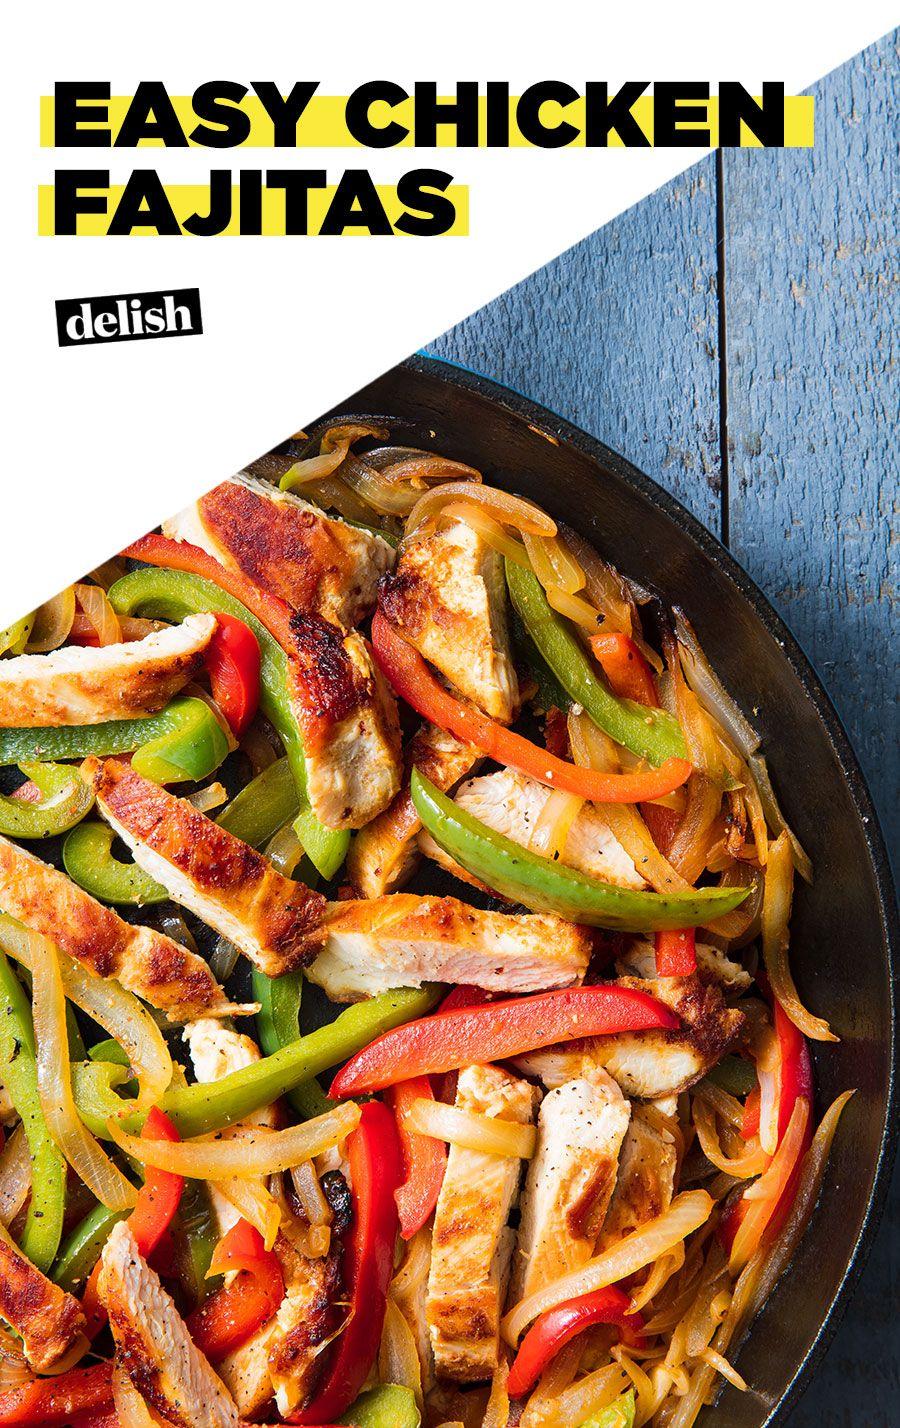 Chicken Fajitas Make The Fastest Weeknight Dinner Recipe Easy Chicken Dinner Recipes Easy Skillet Dinner Easy Chicken Dinners